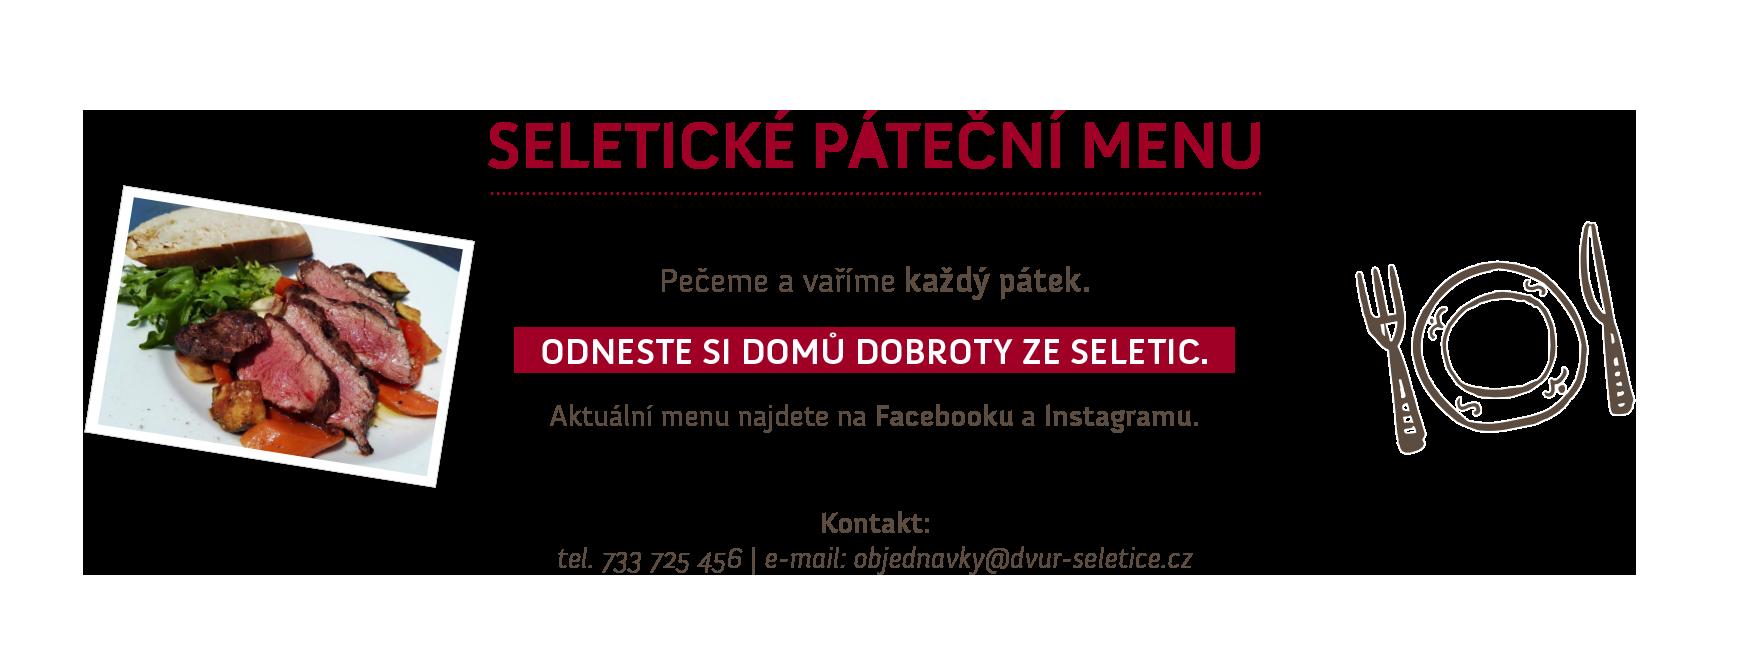 [hp-slider/SELE_slider_web_Patecni_menu.png]